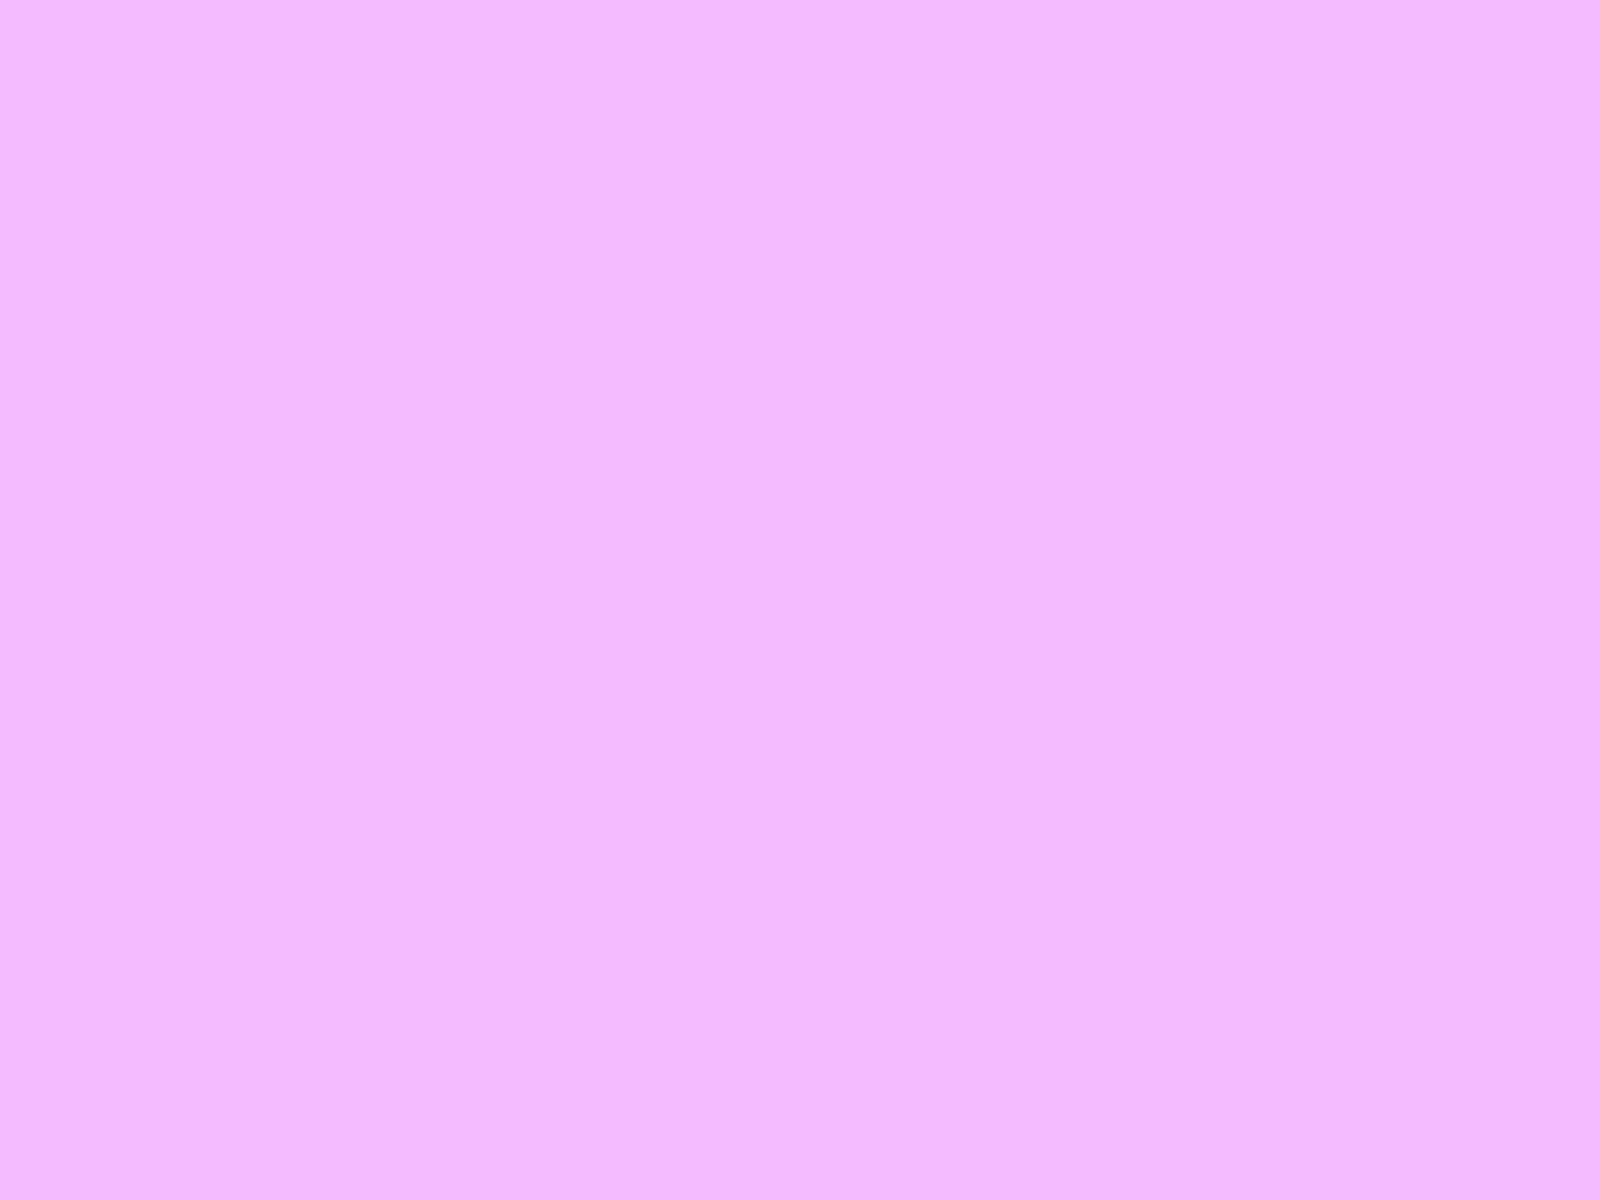 1600x1200 Brilliant Lavender Solid Color Background